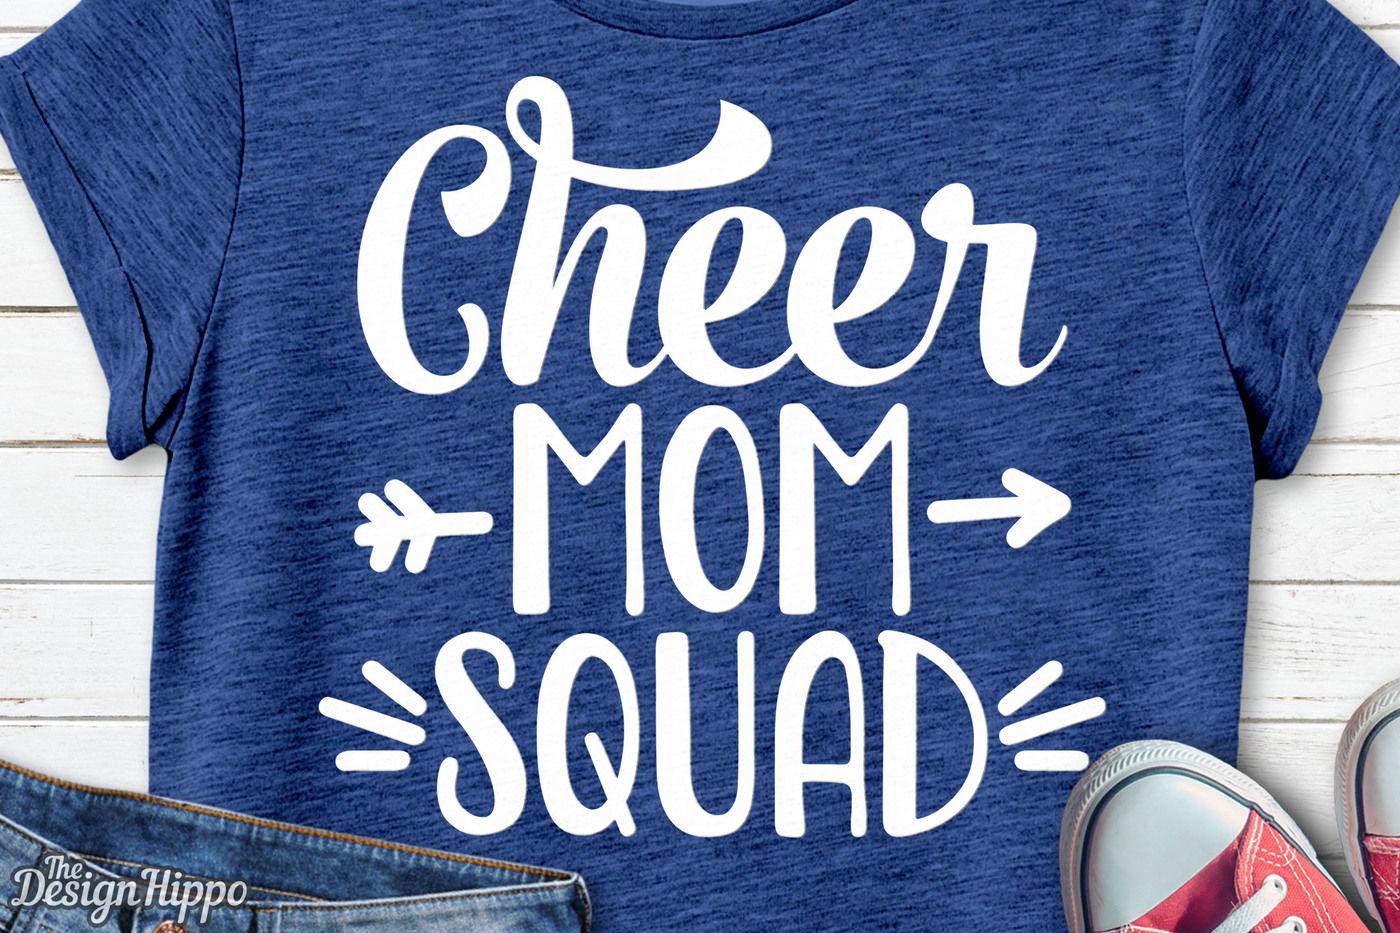 Cheer Mom Squad Svg Cheer Svg Mom Svg Squad Svg Png Dxf Cut